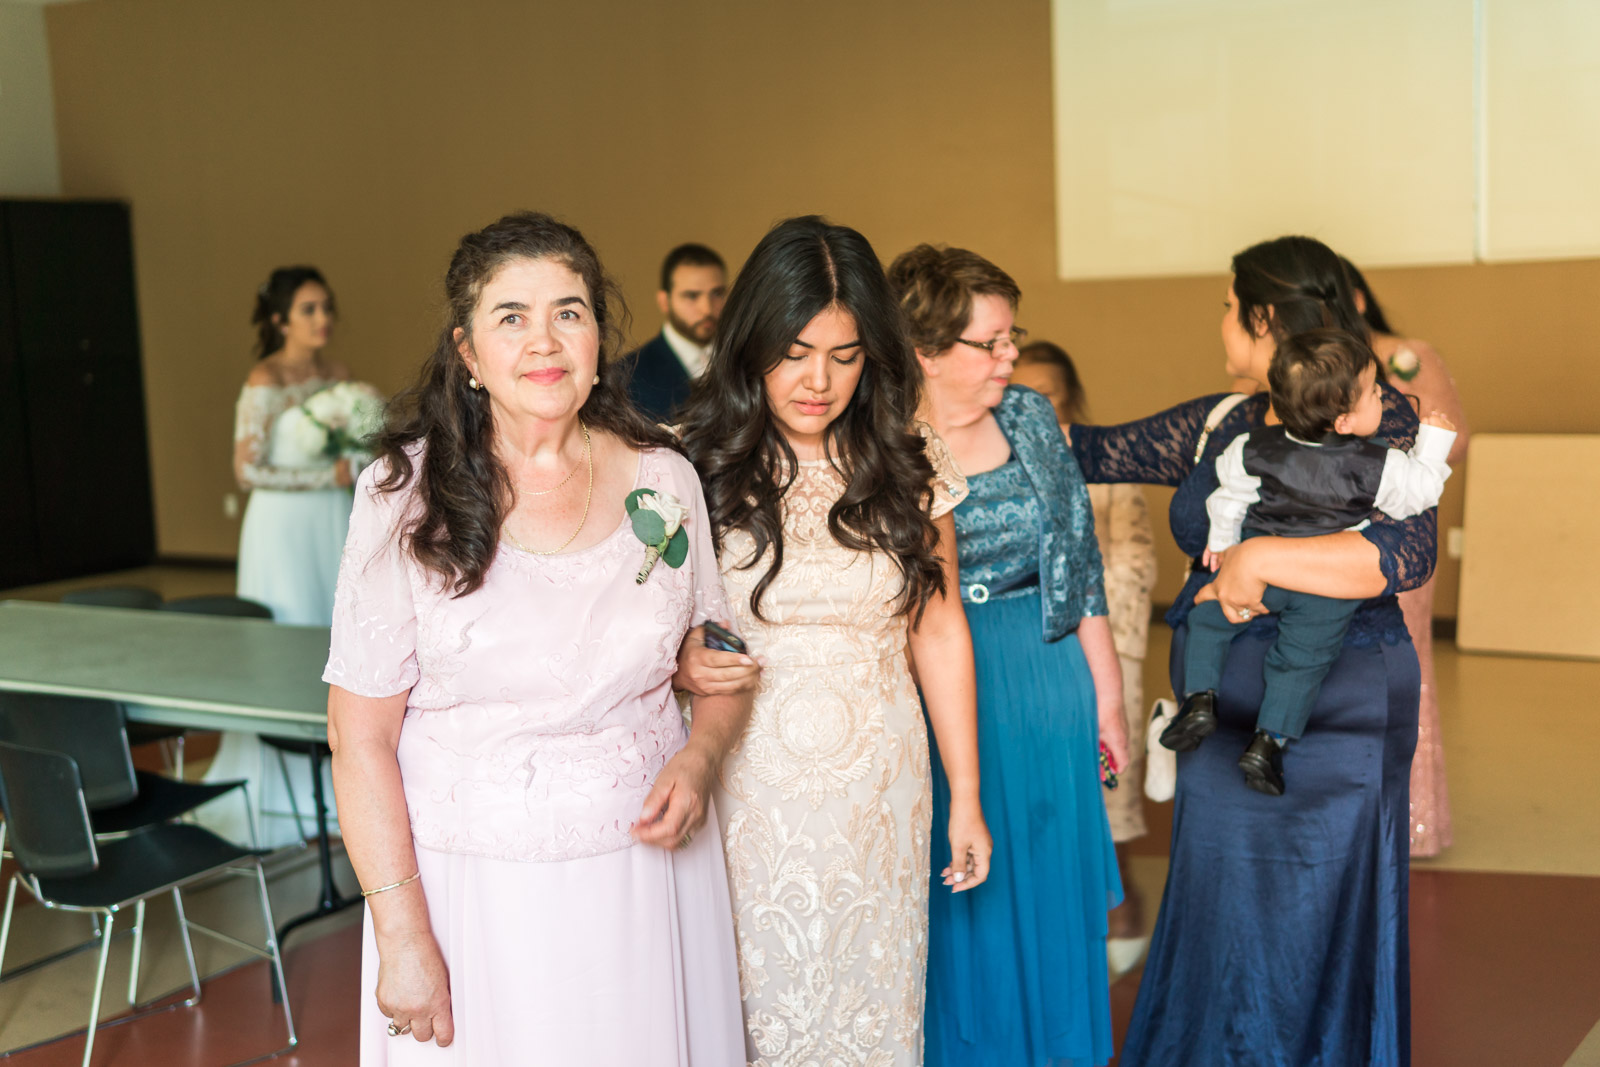 128_Angel-Brea-Orange-County_Joseph-Barber-Wedding-Photography.jpg